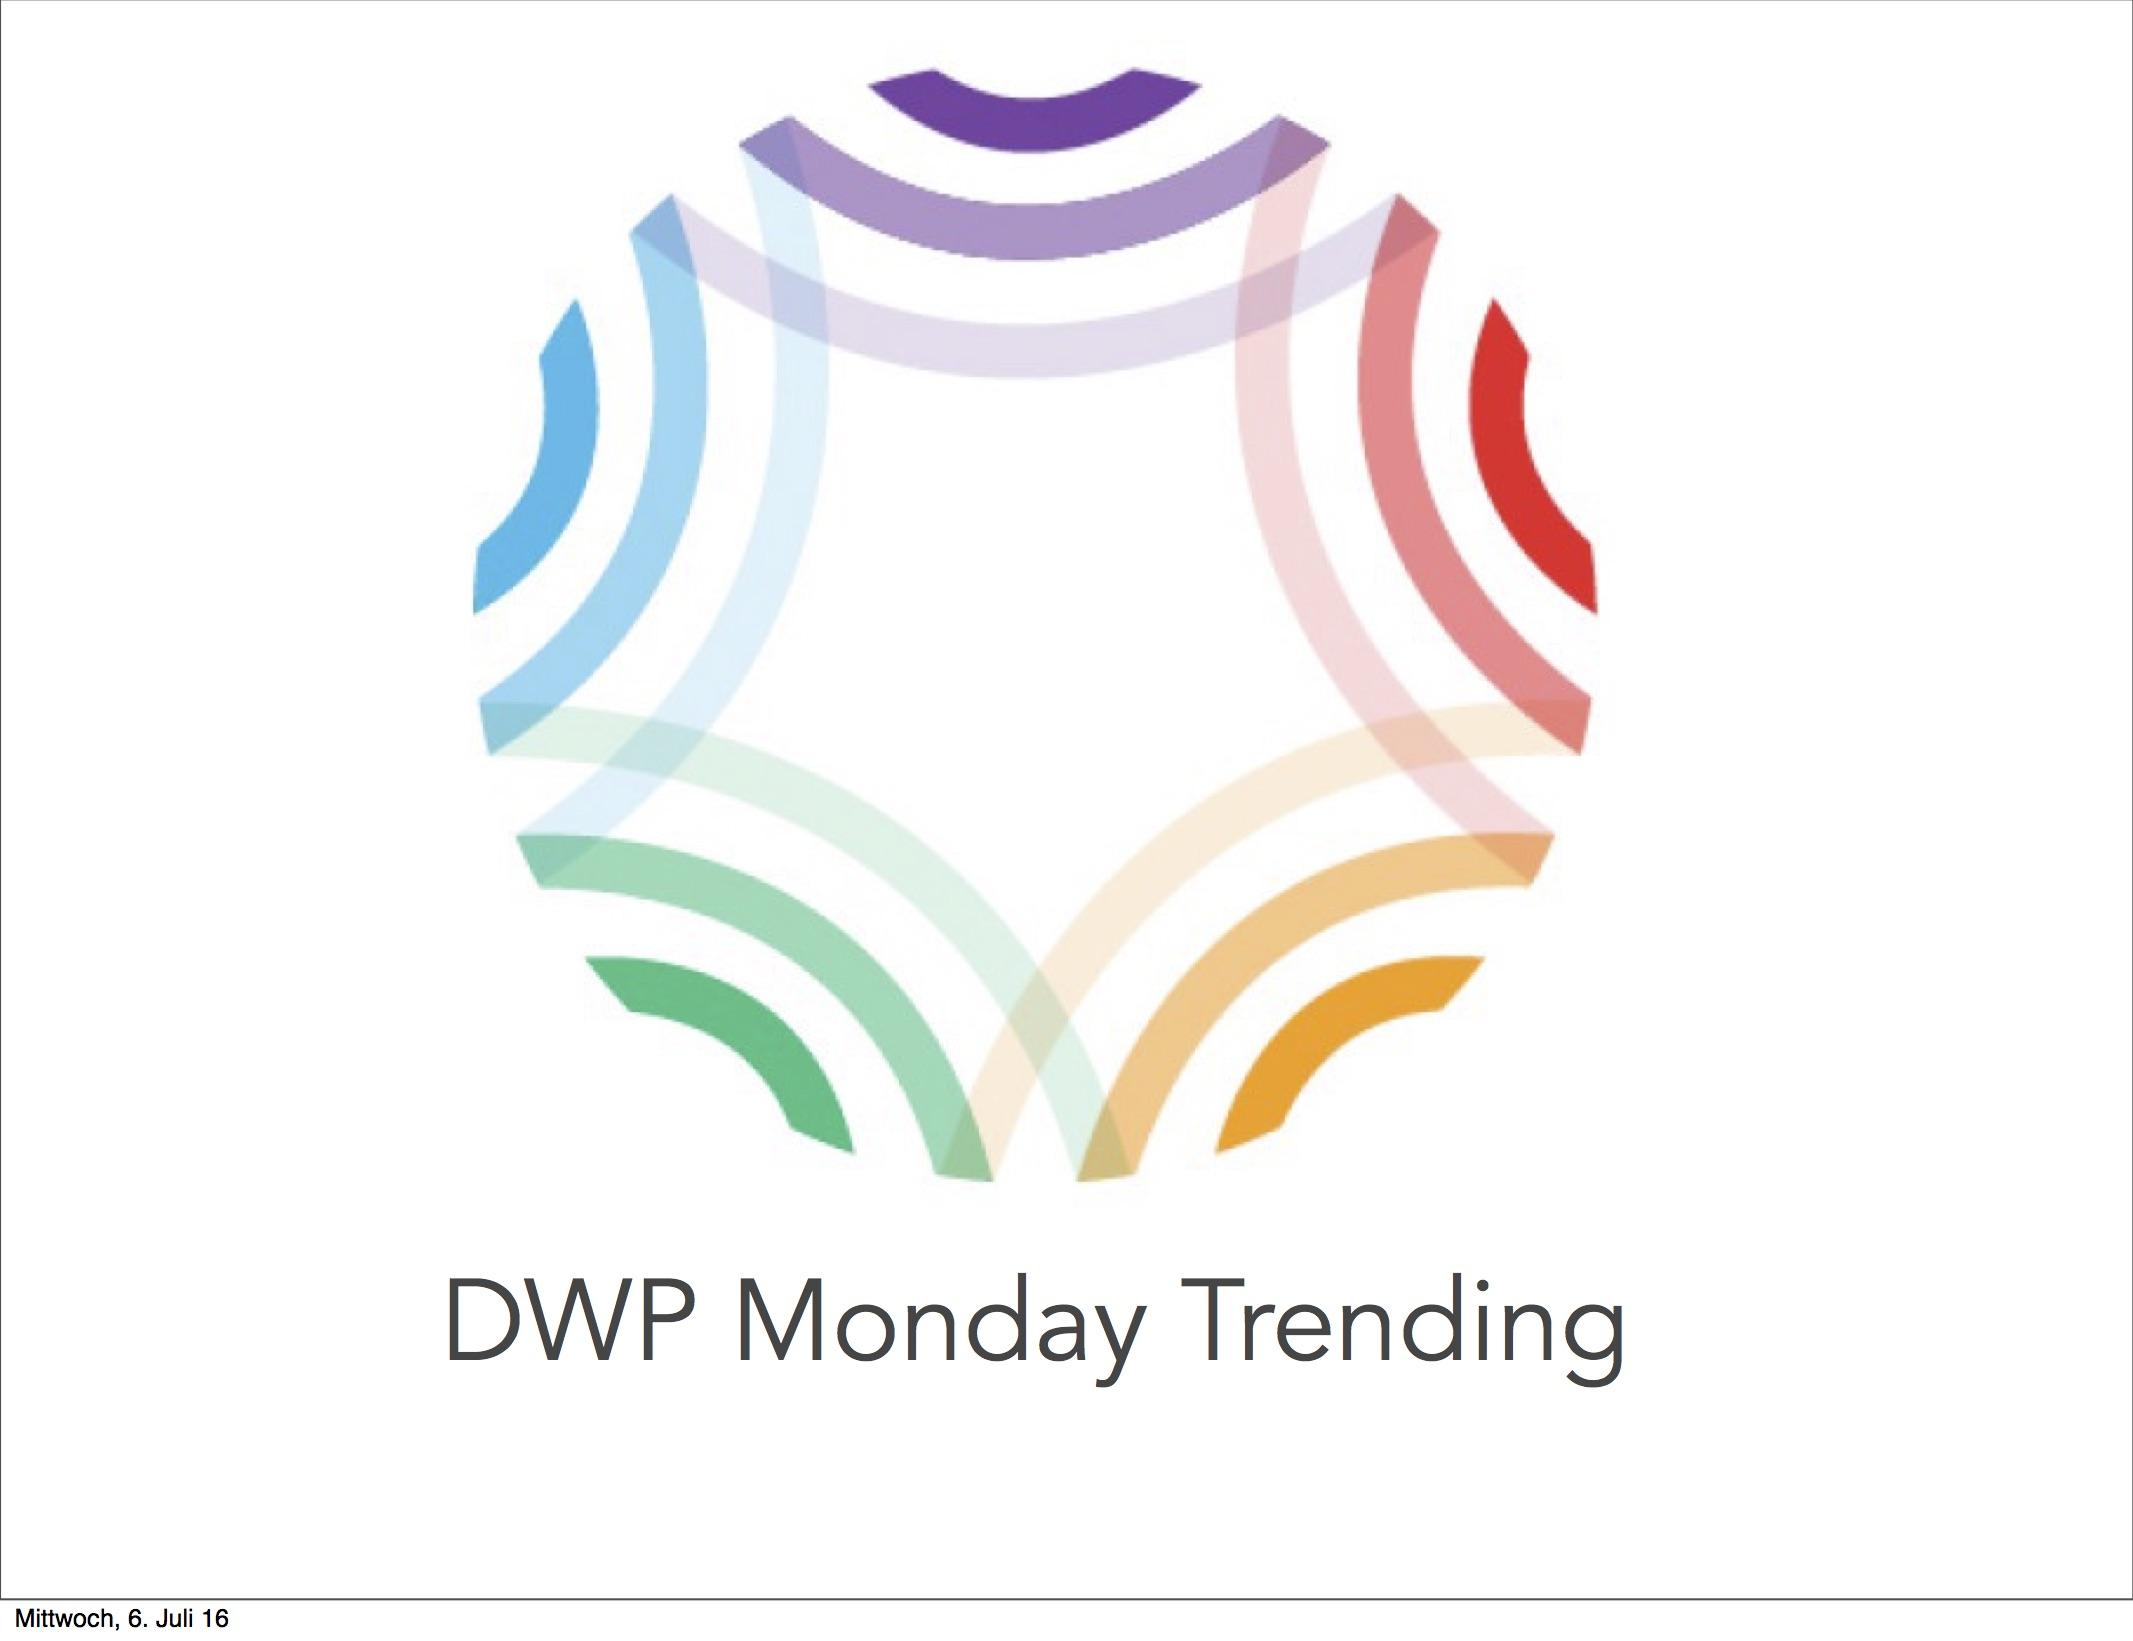 DWP Monday Trending jpg